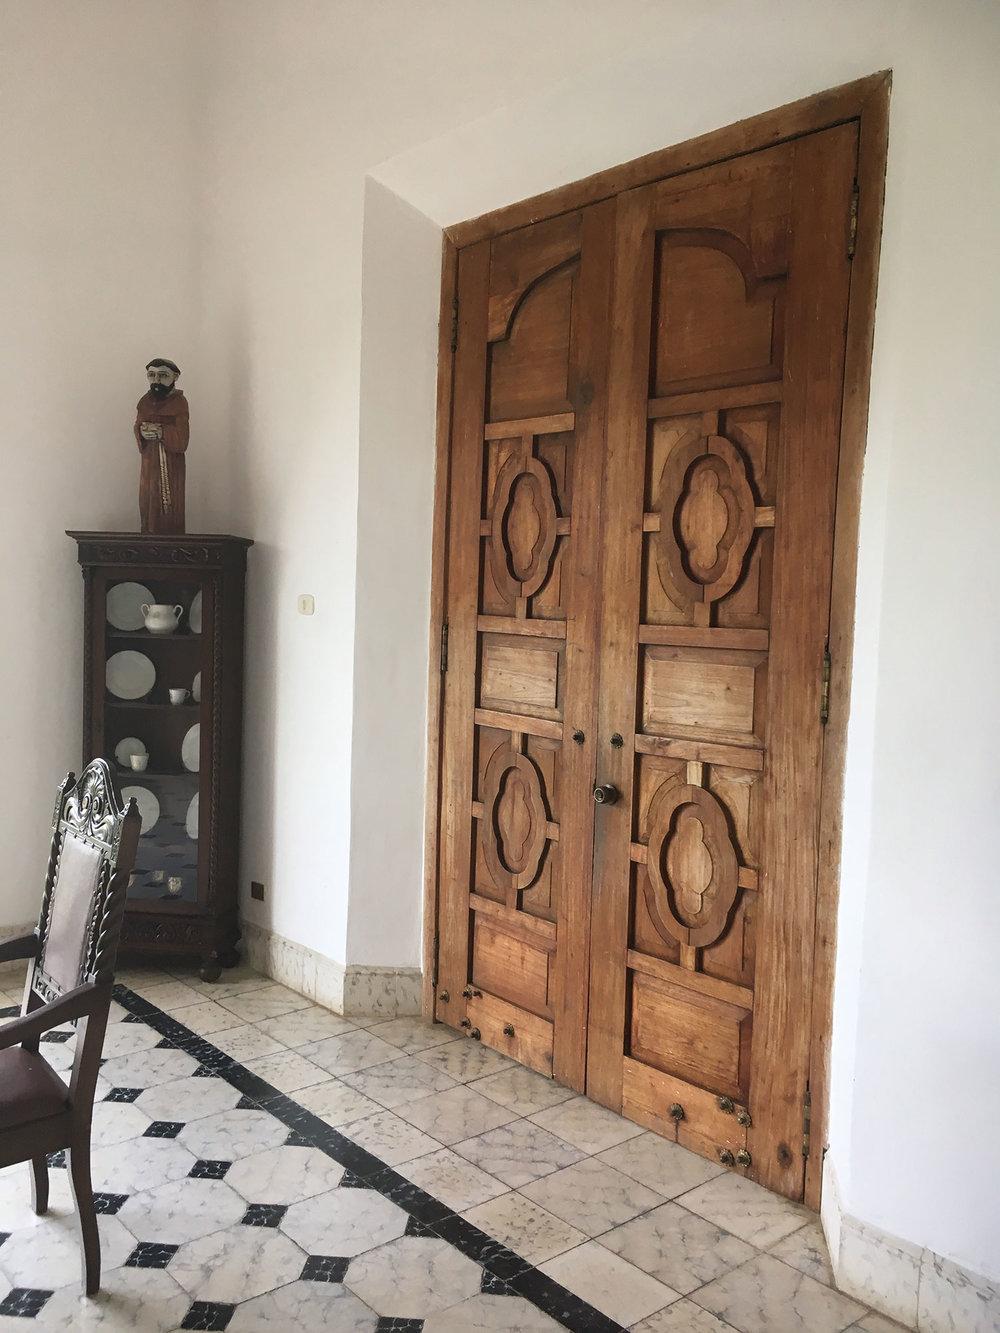 Hammocks_and_Ruins_Blog_Riviera_Maya_Mexico_Travel_Discover_Yucatan_What_to_do_Merida_Haciendas_Tepich_14.jpg